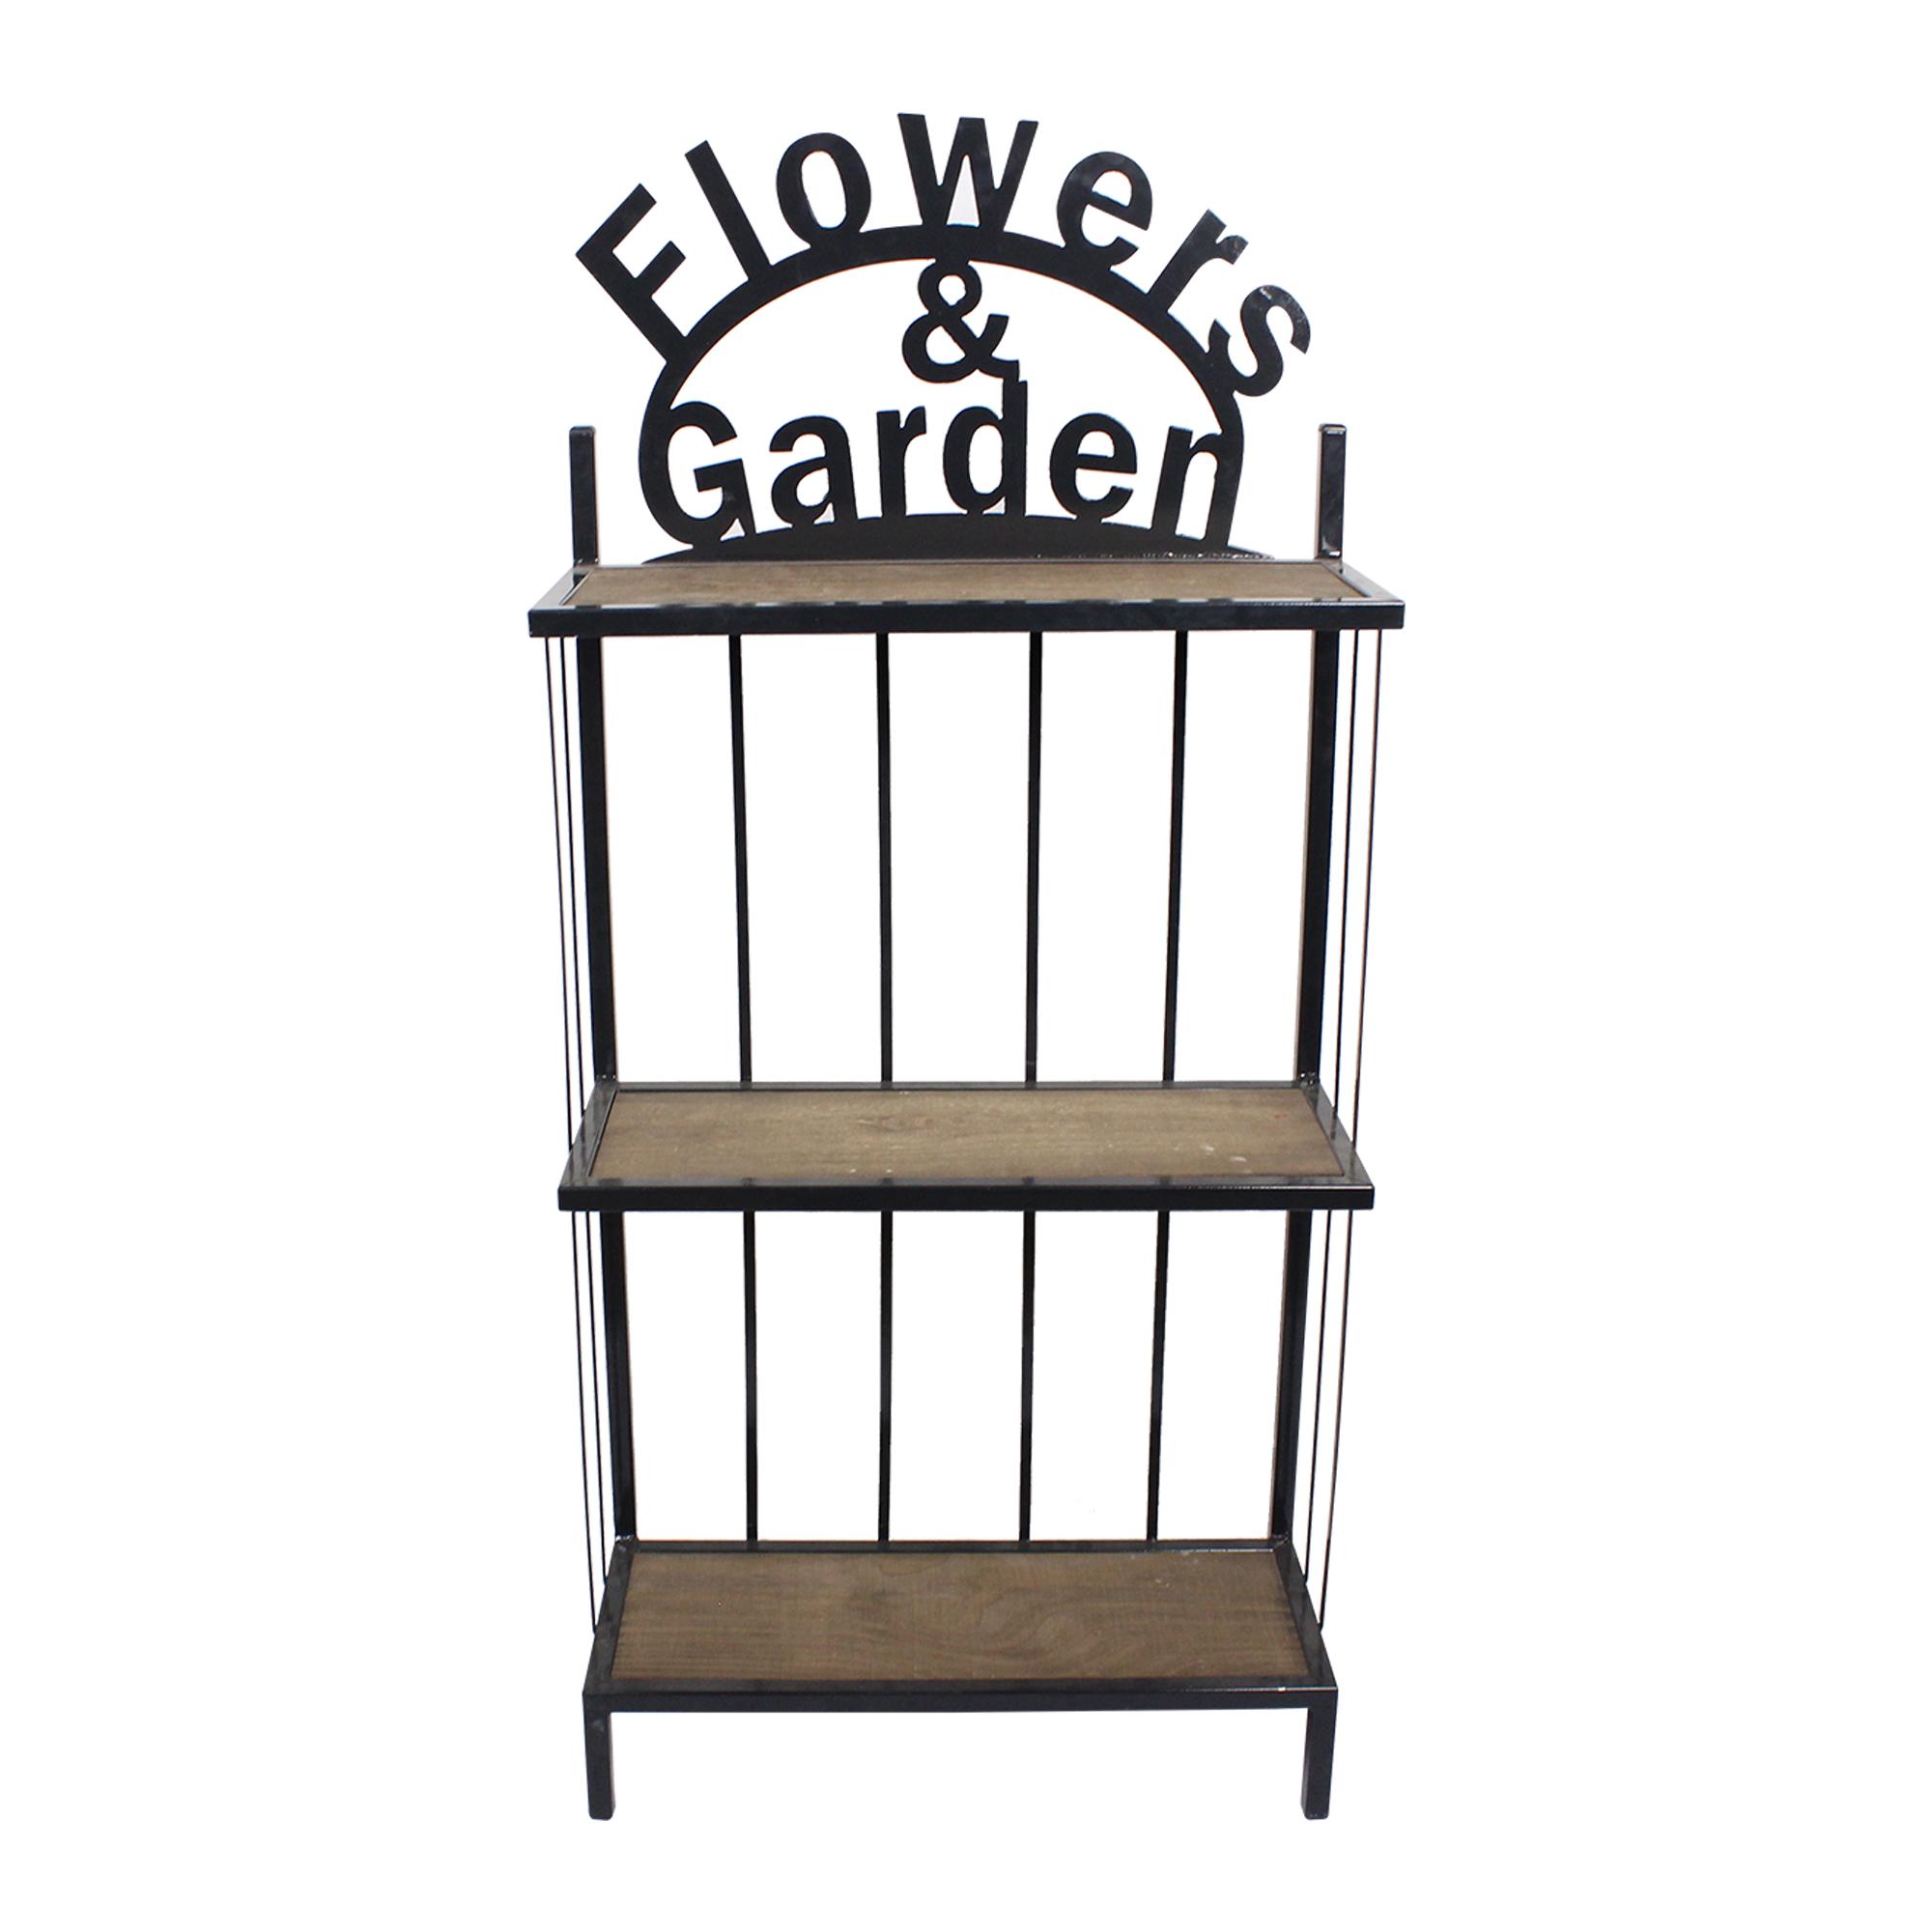 Prateleira Flowers & Garden